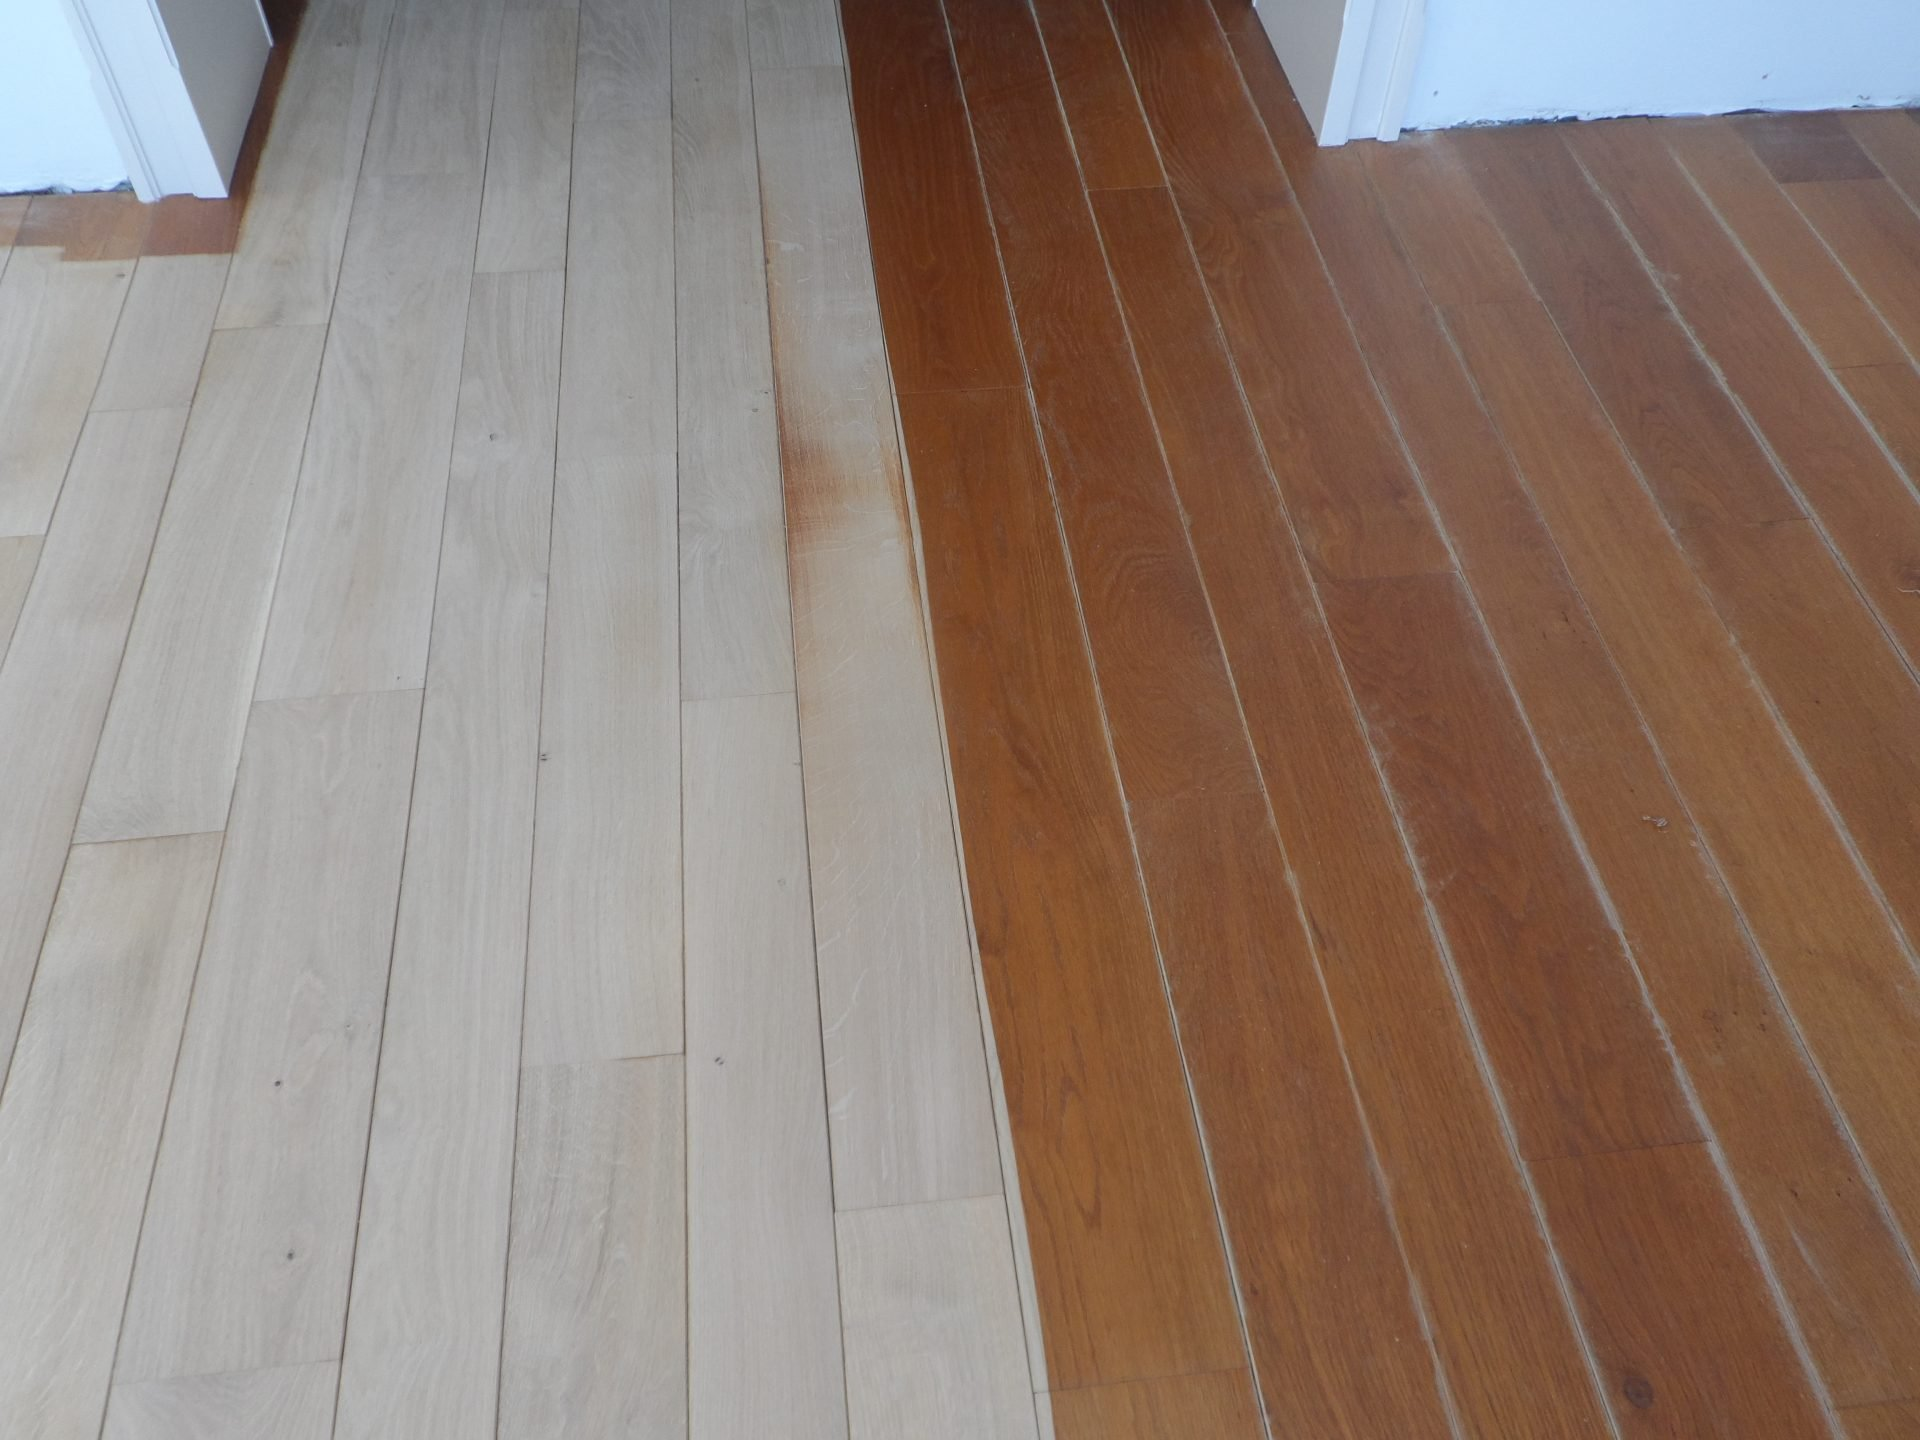 7-eiken-tapisvloer-en-trap-gerookt-ingekleurd-met-extra-wit-12